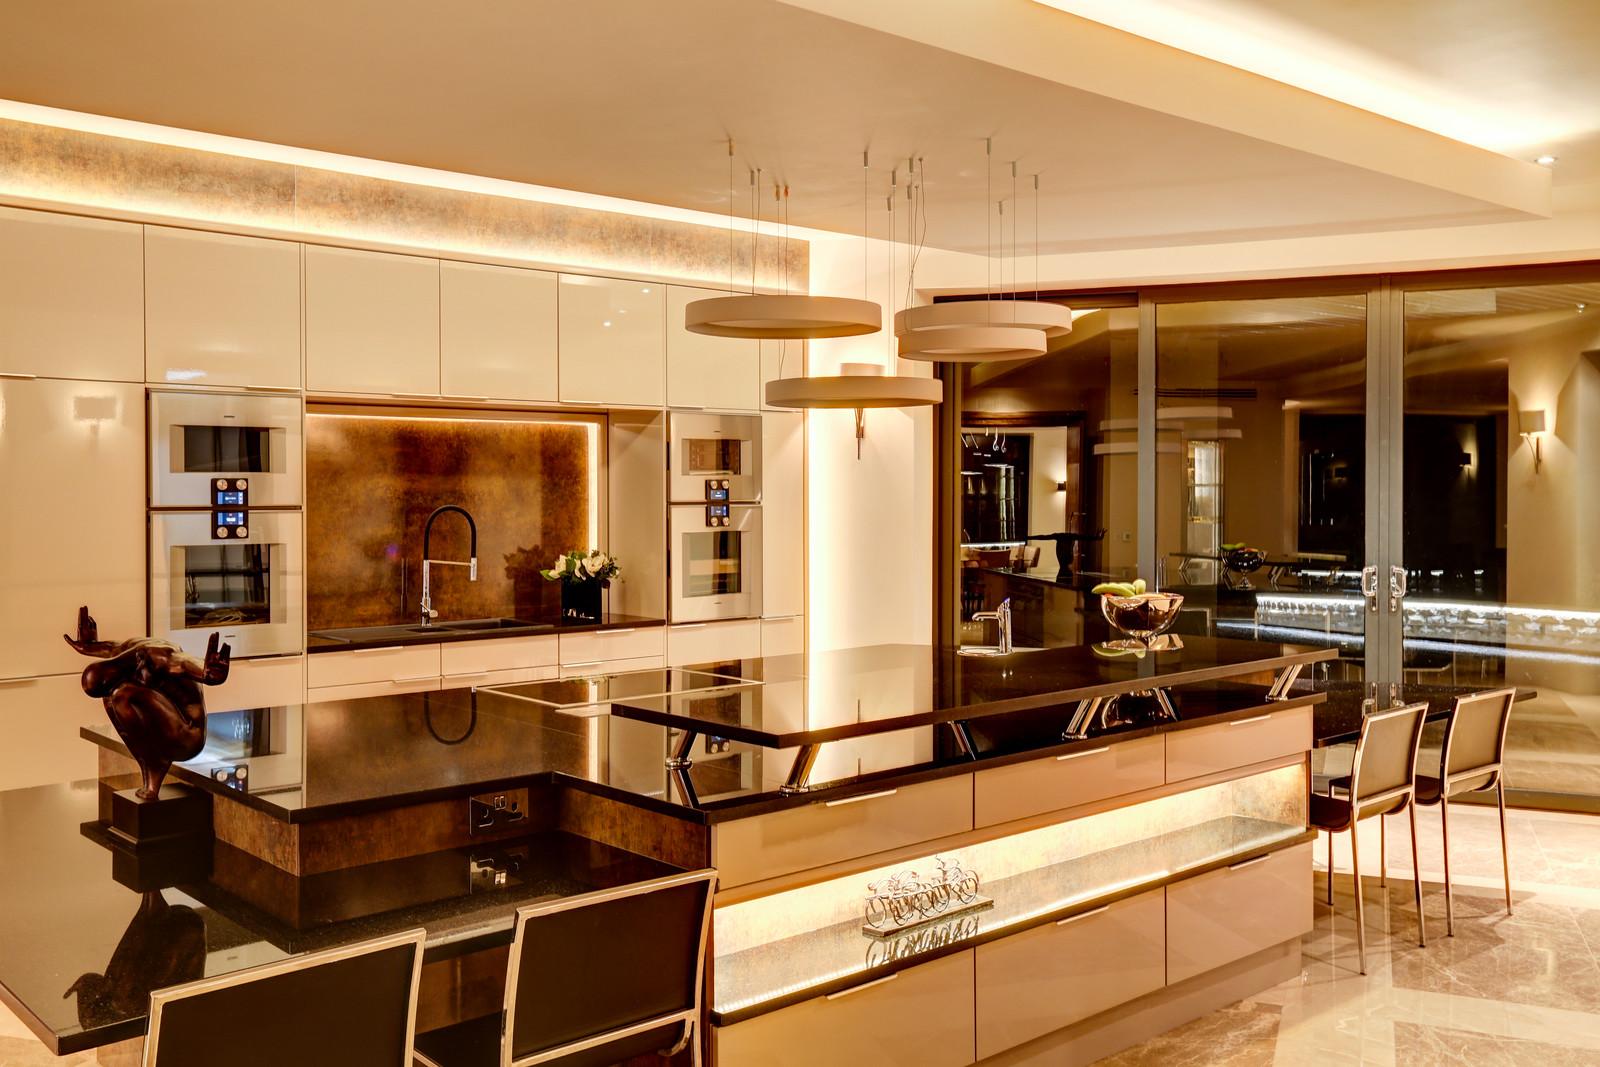 Designer kitchen, Tanglewood, Colston Bassett by Guy Phoenix